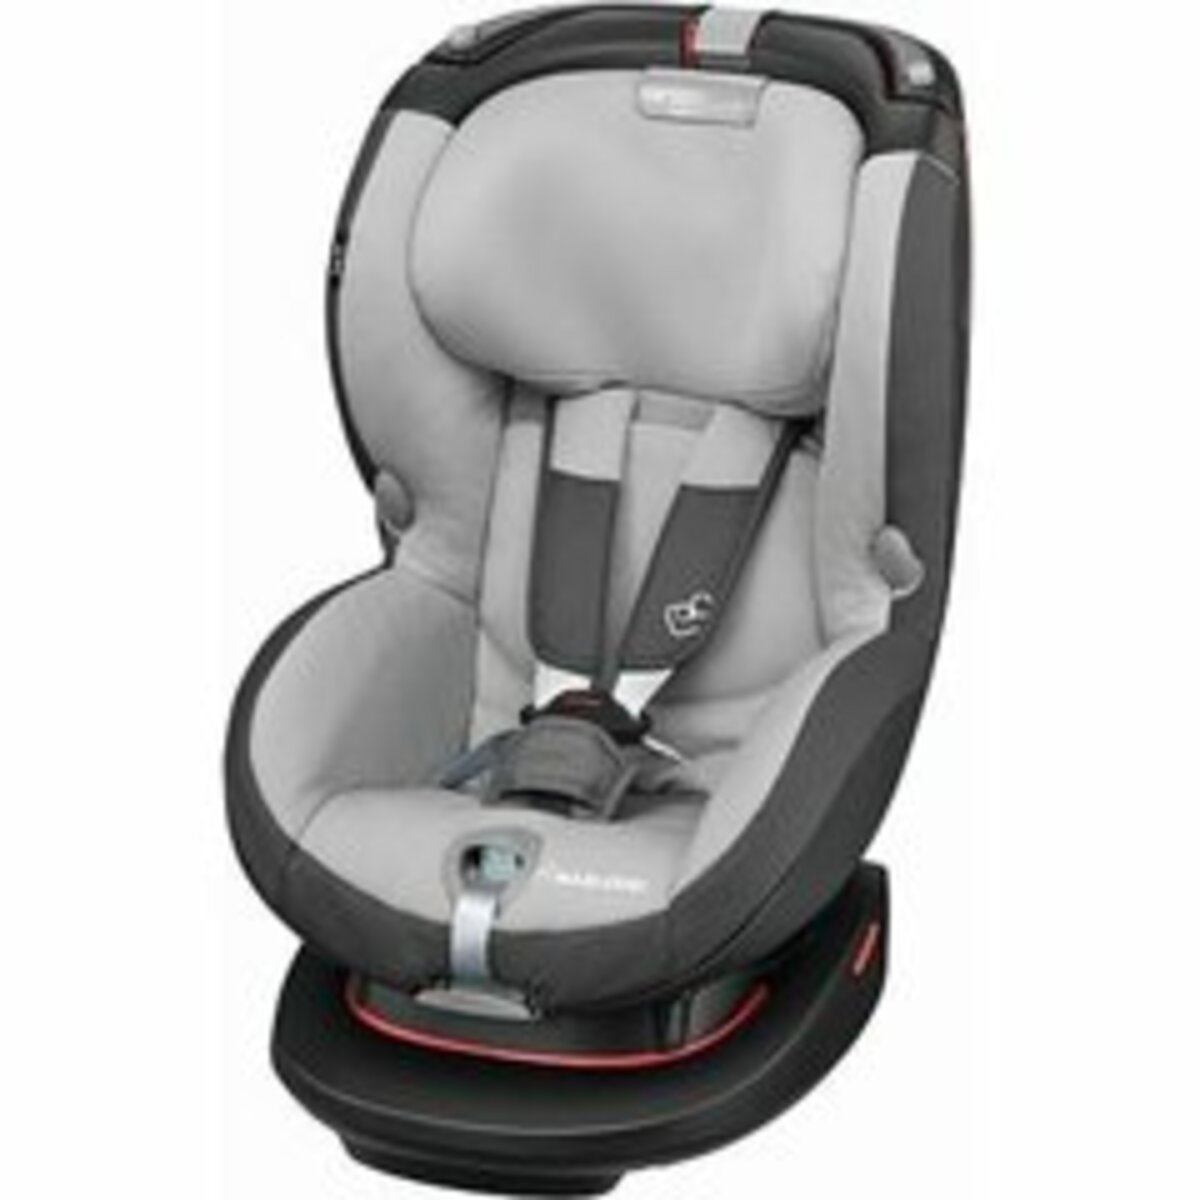 Bild 3 von Maxi-Cosi - Kindersitz Rubi XP, Dawn Grey